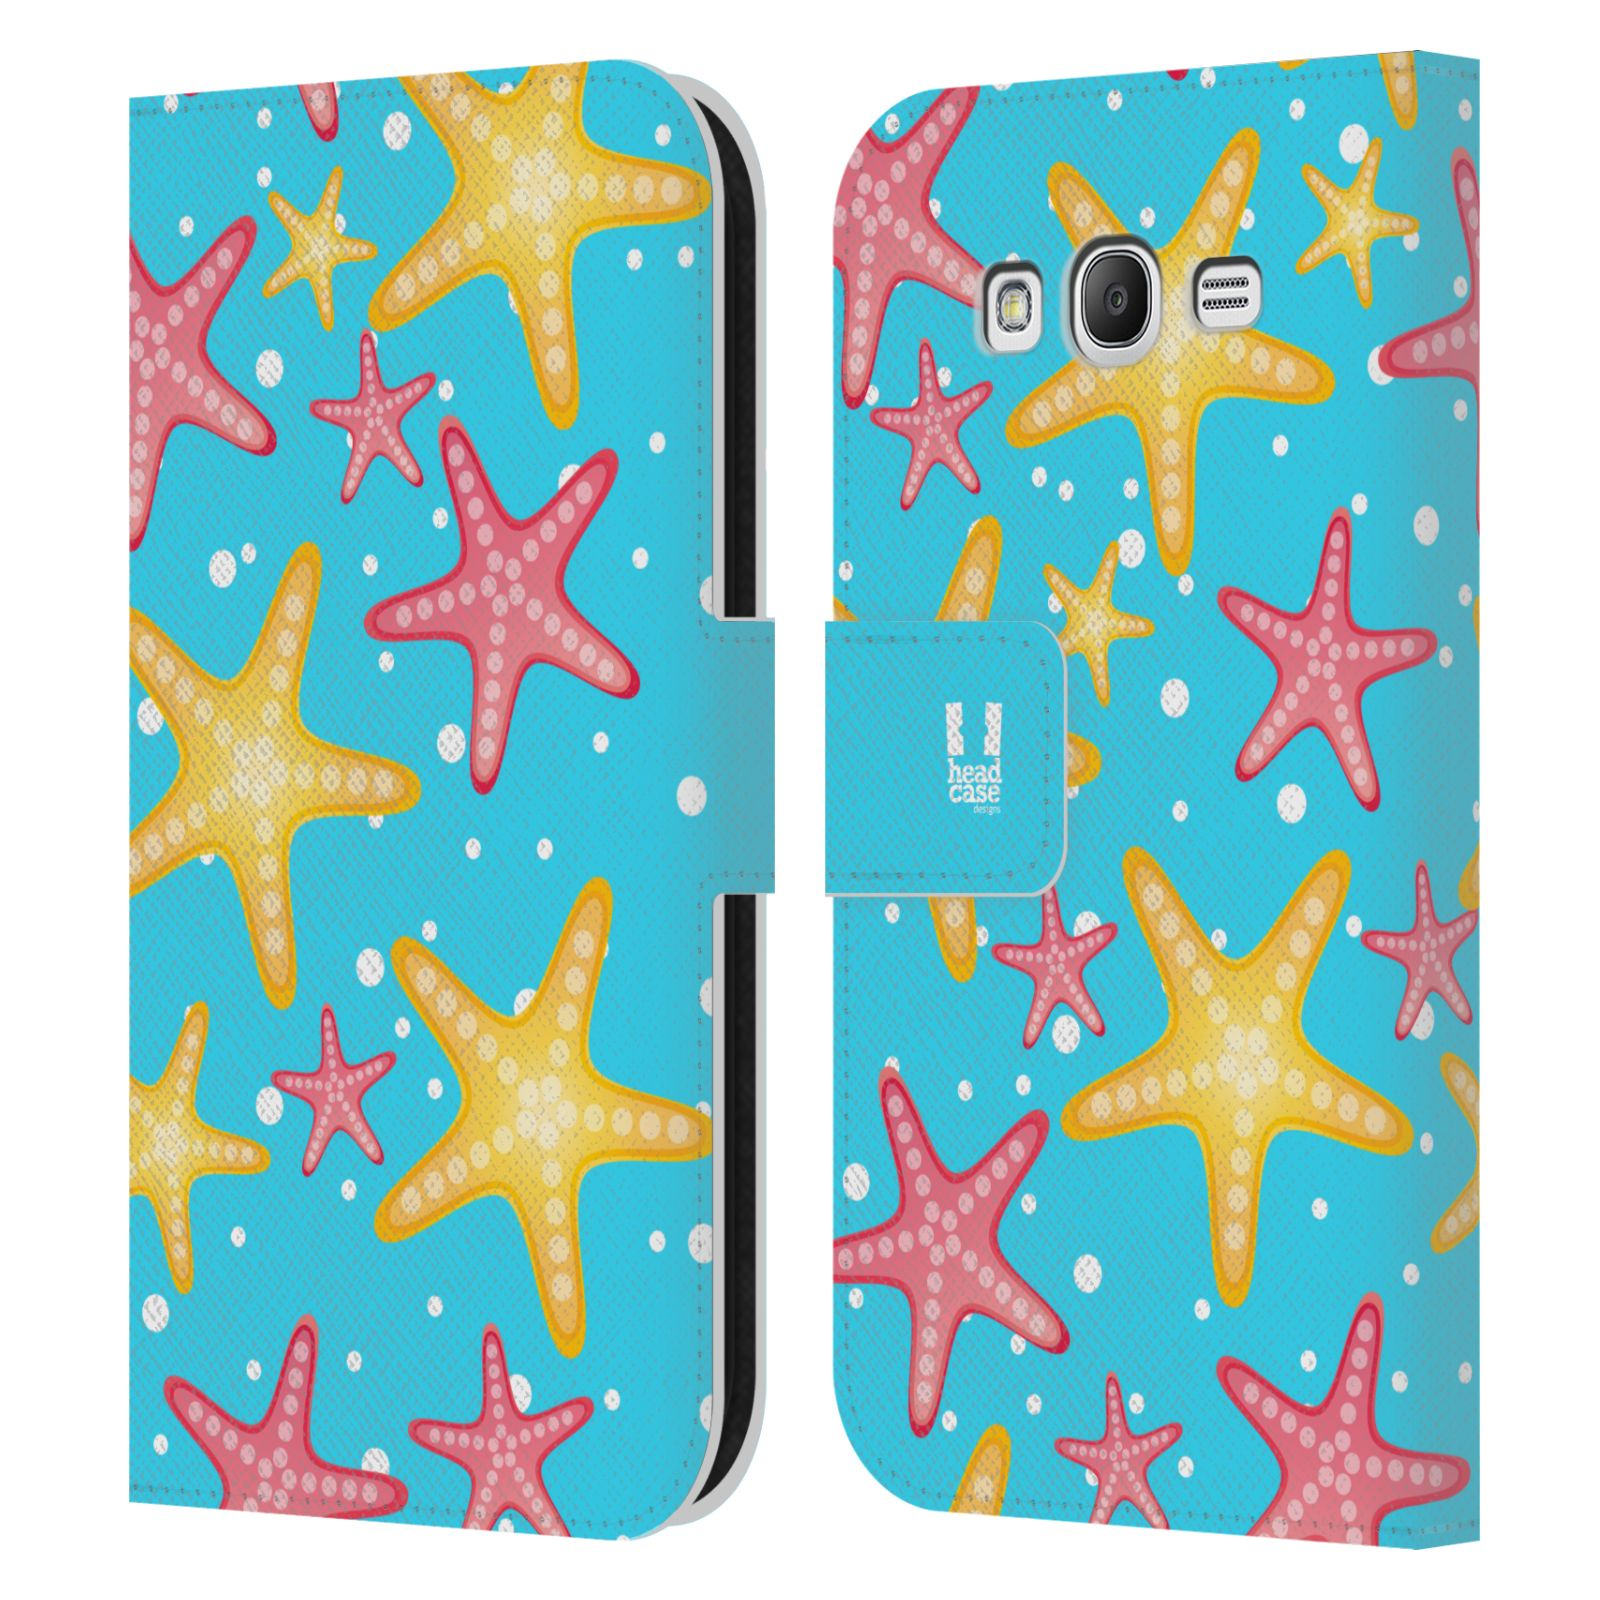 HEAD CASE Flipové pouzdro pro mobil Samsung Galaxy Grand i9080 Mořský živočich hvězdice modrá barva pozadí